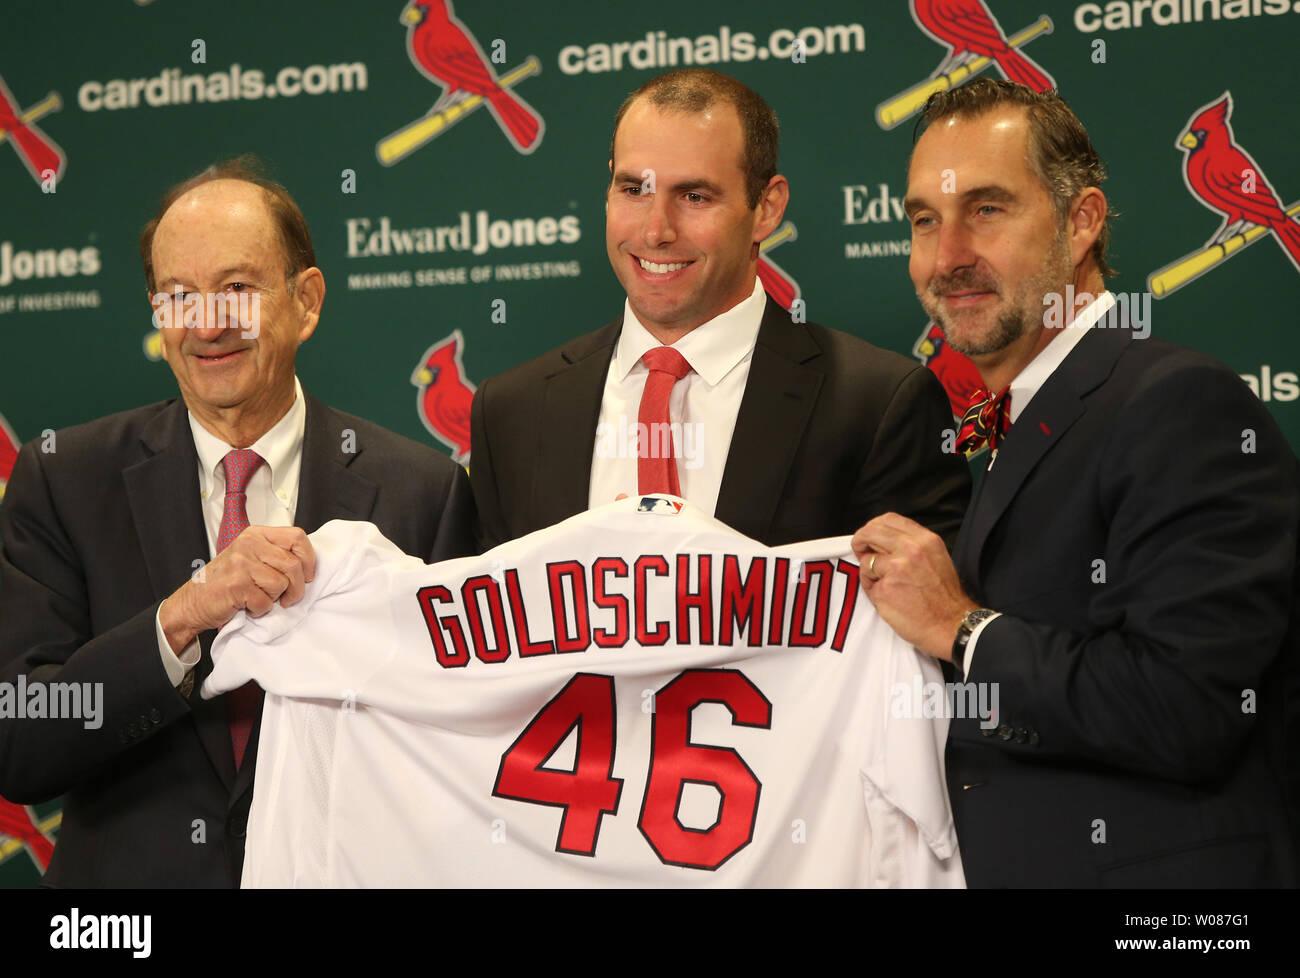 John Goldschmidt Stock Photos & John Goldschmidt Stock